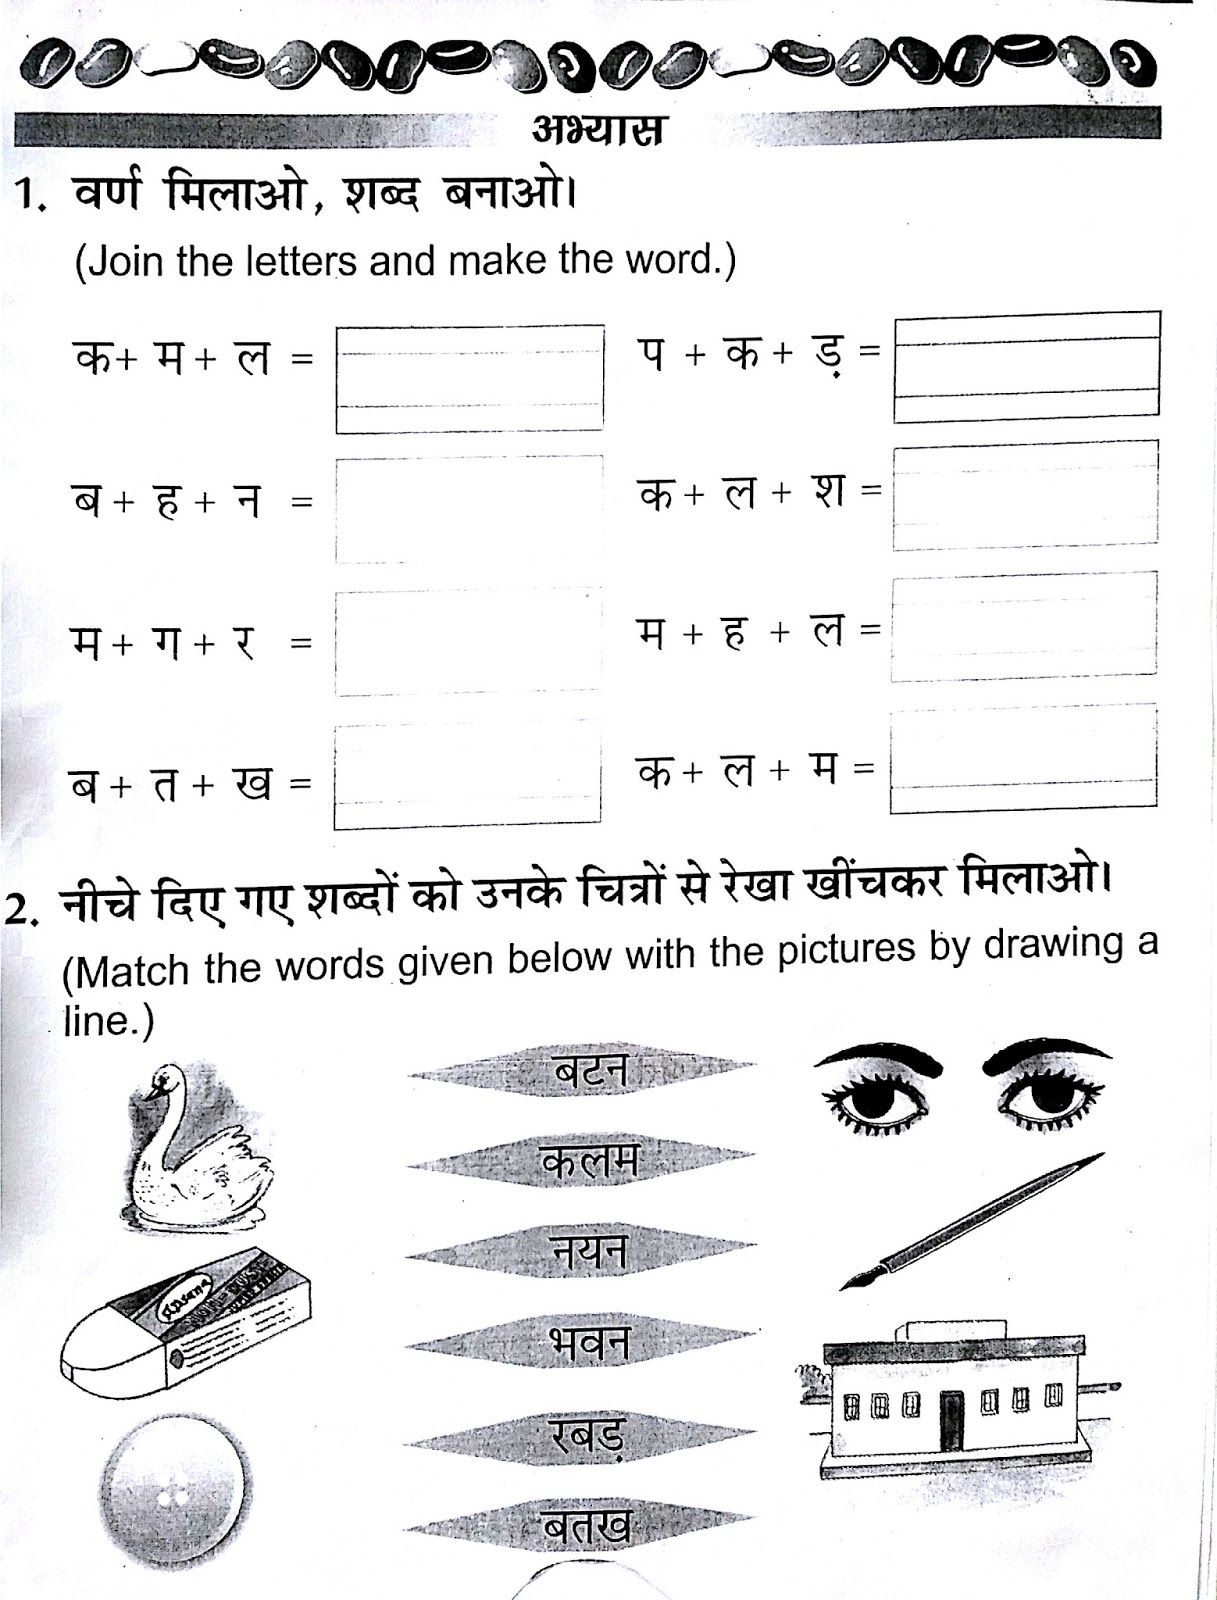 Hindi Worksheets Hindi Language Learning Learn Hindi [ 1600 x 1217 Pixel ]